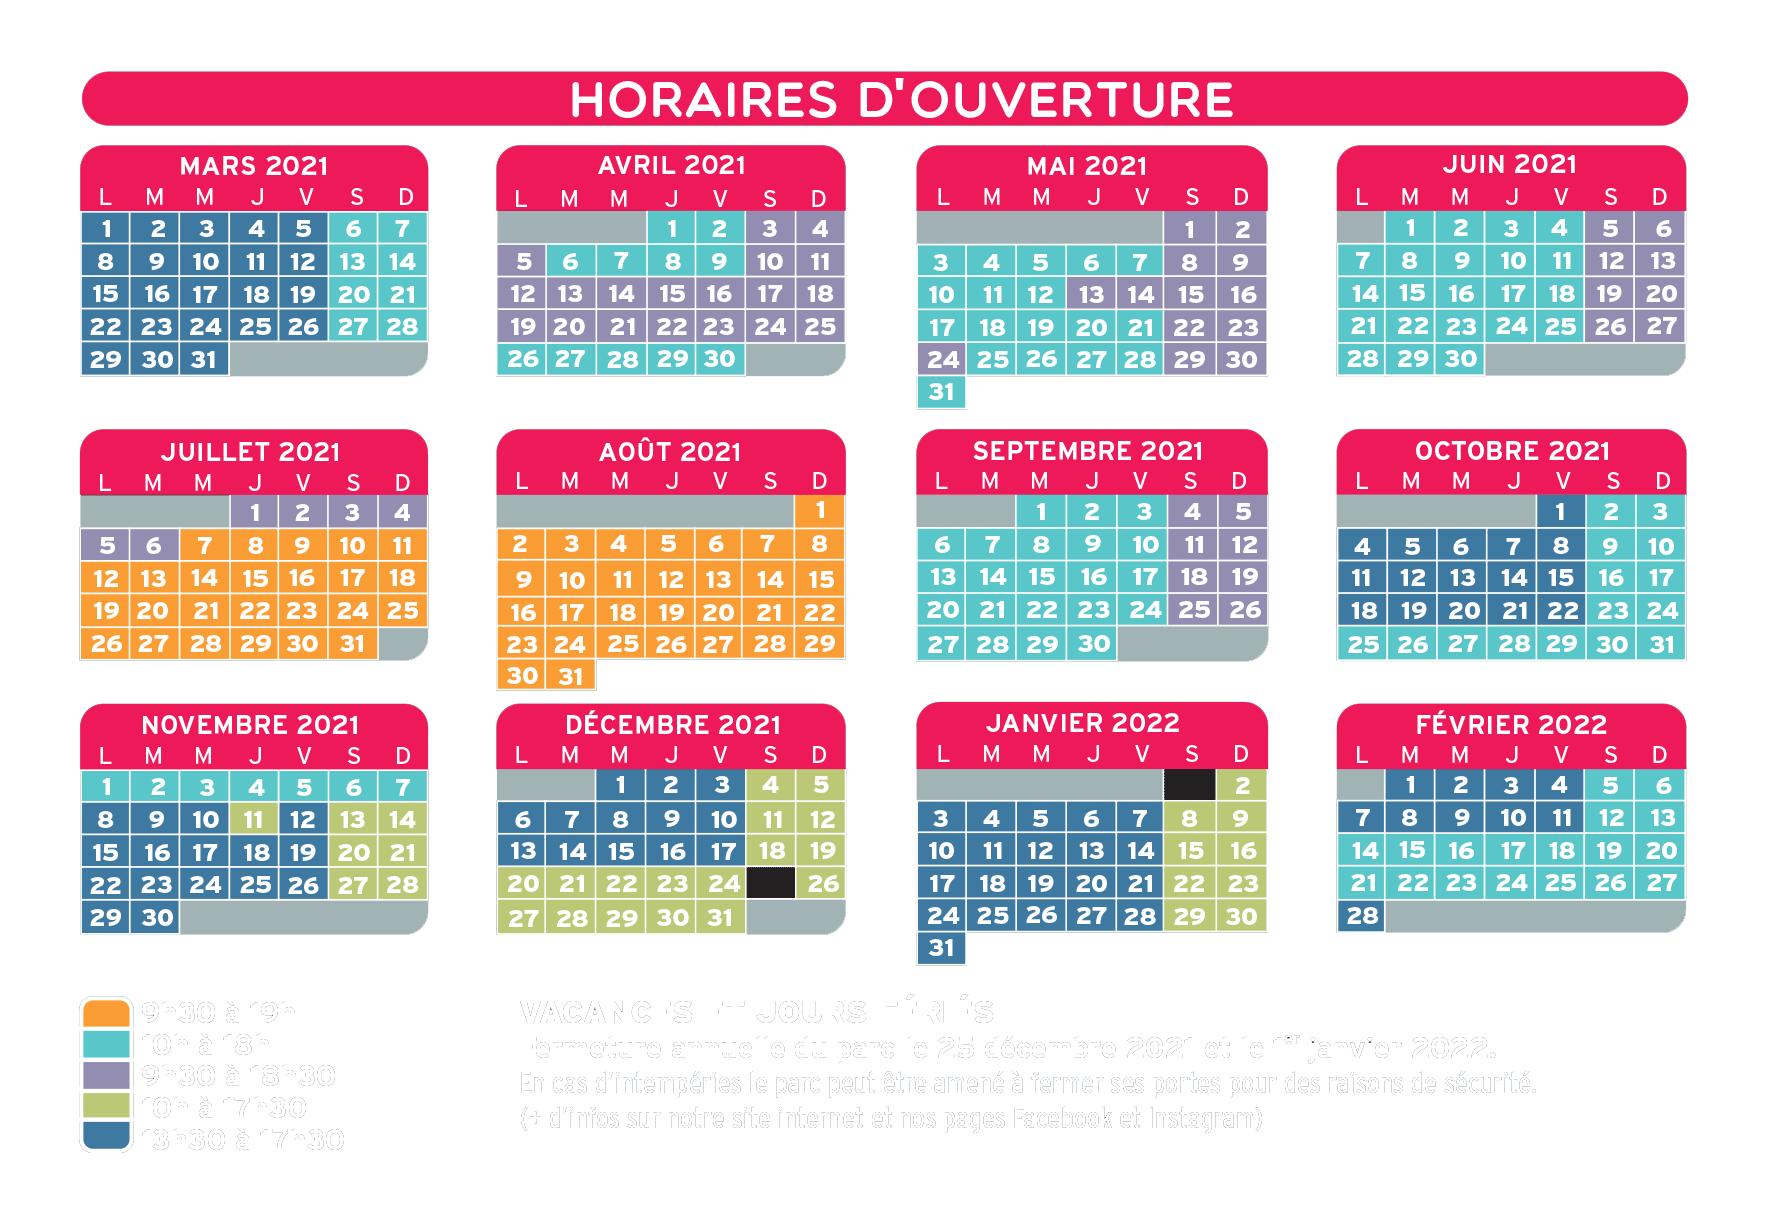 Horaires 2021